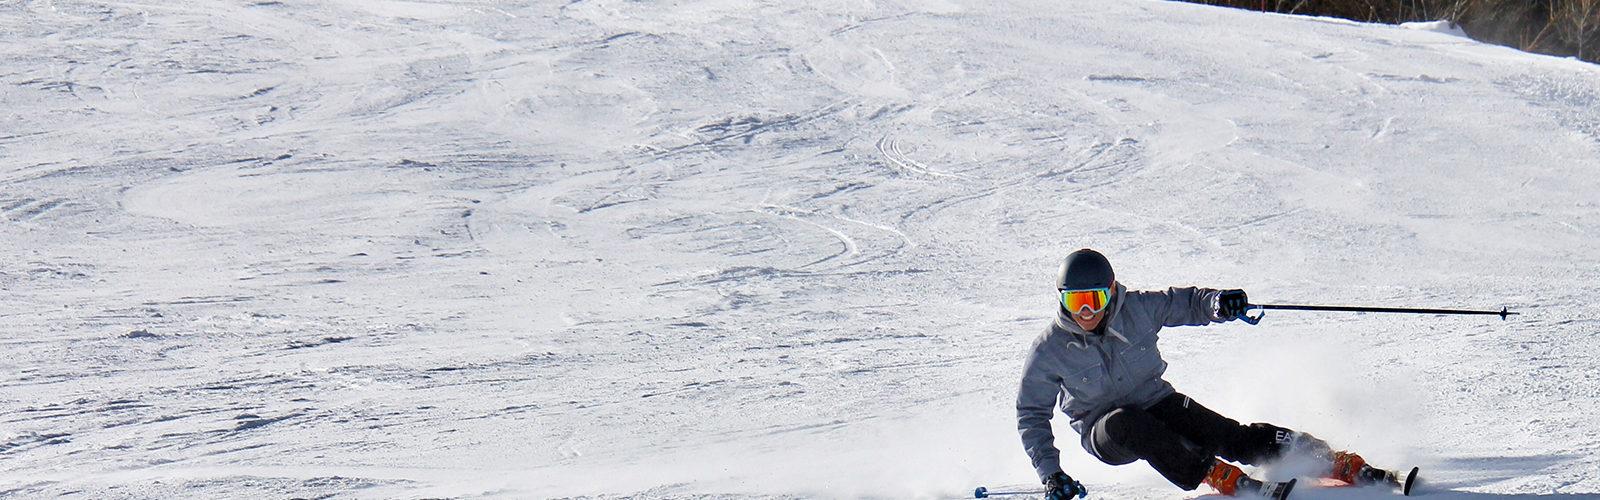 ski-boston-2